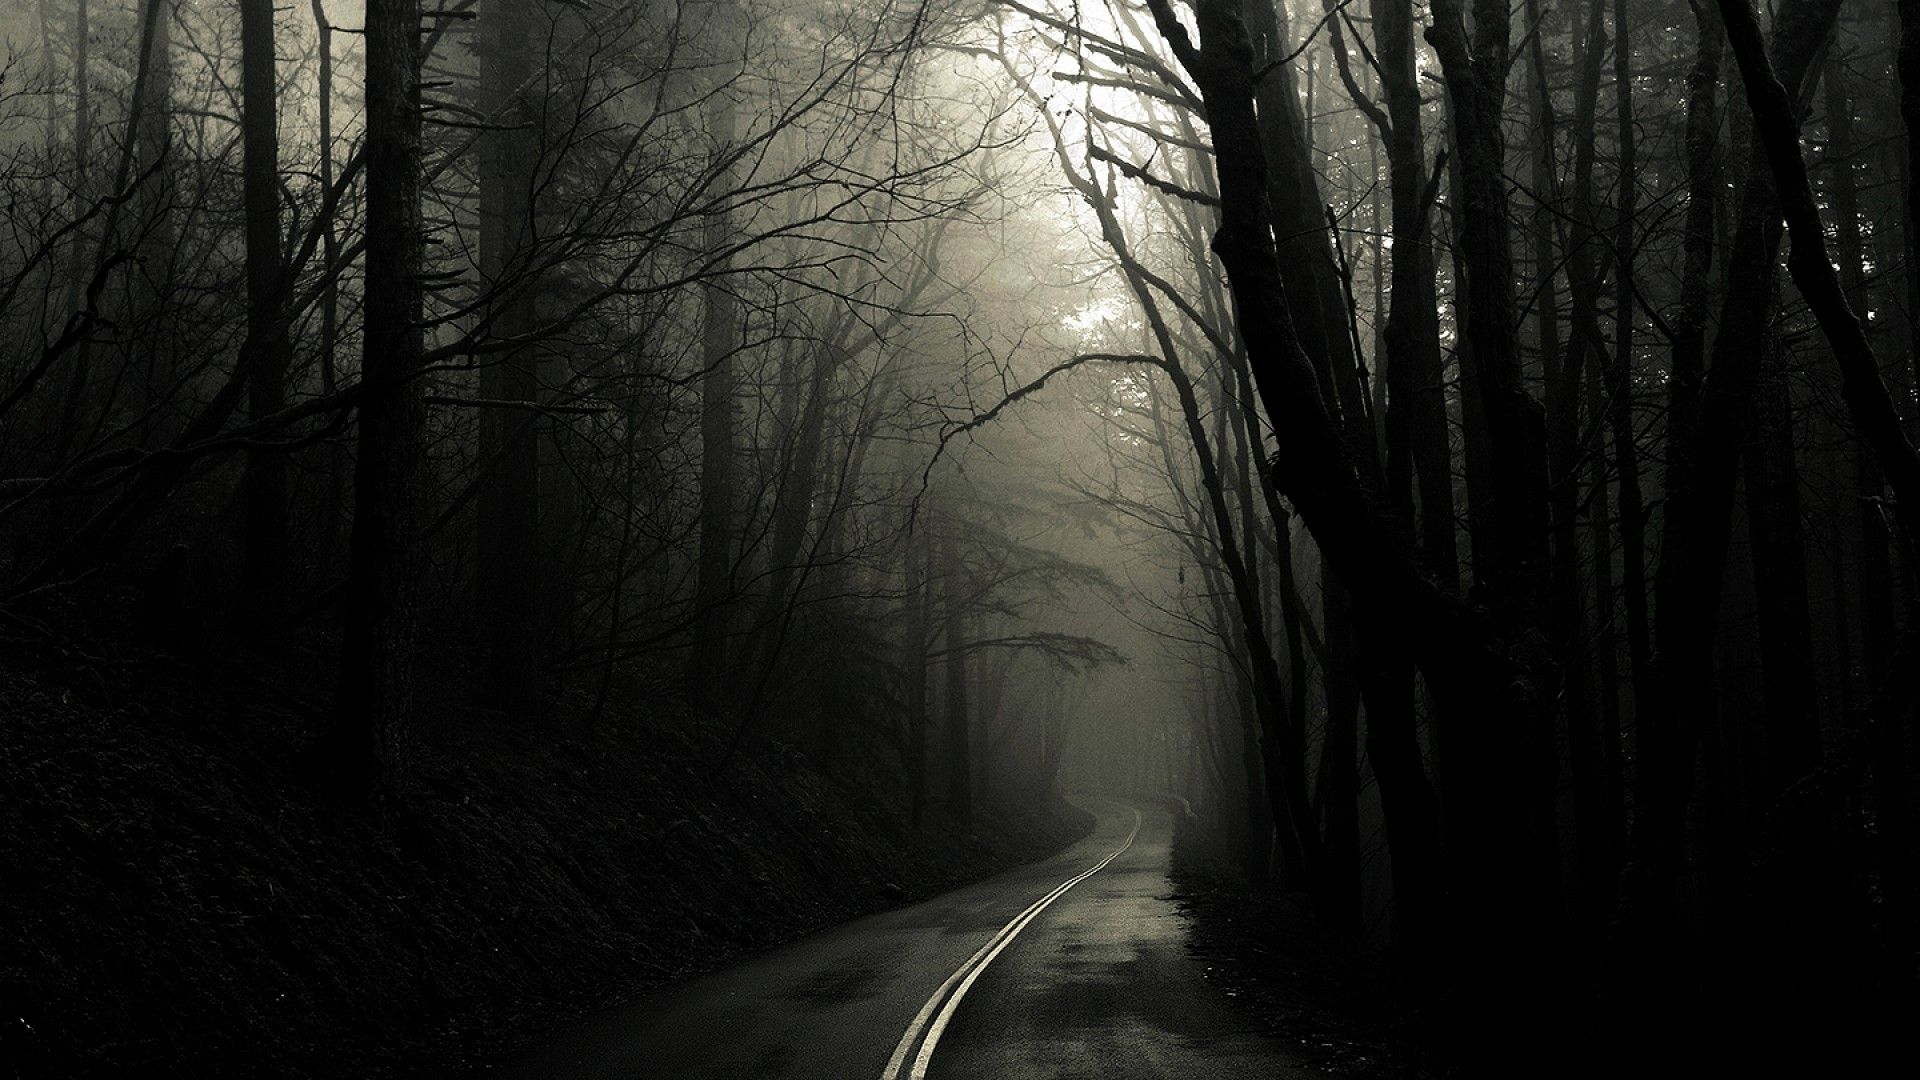 Dark Road Forest Mist Black White Wallpapers For Desktop Free